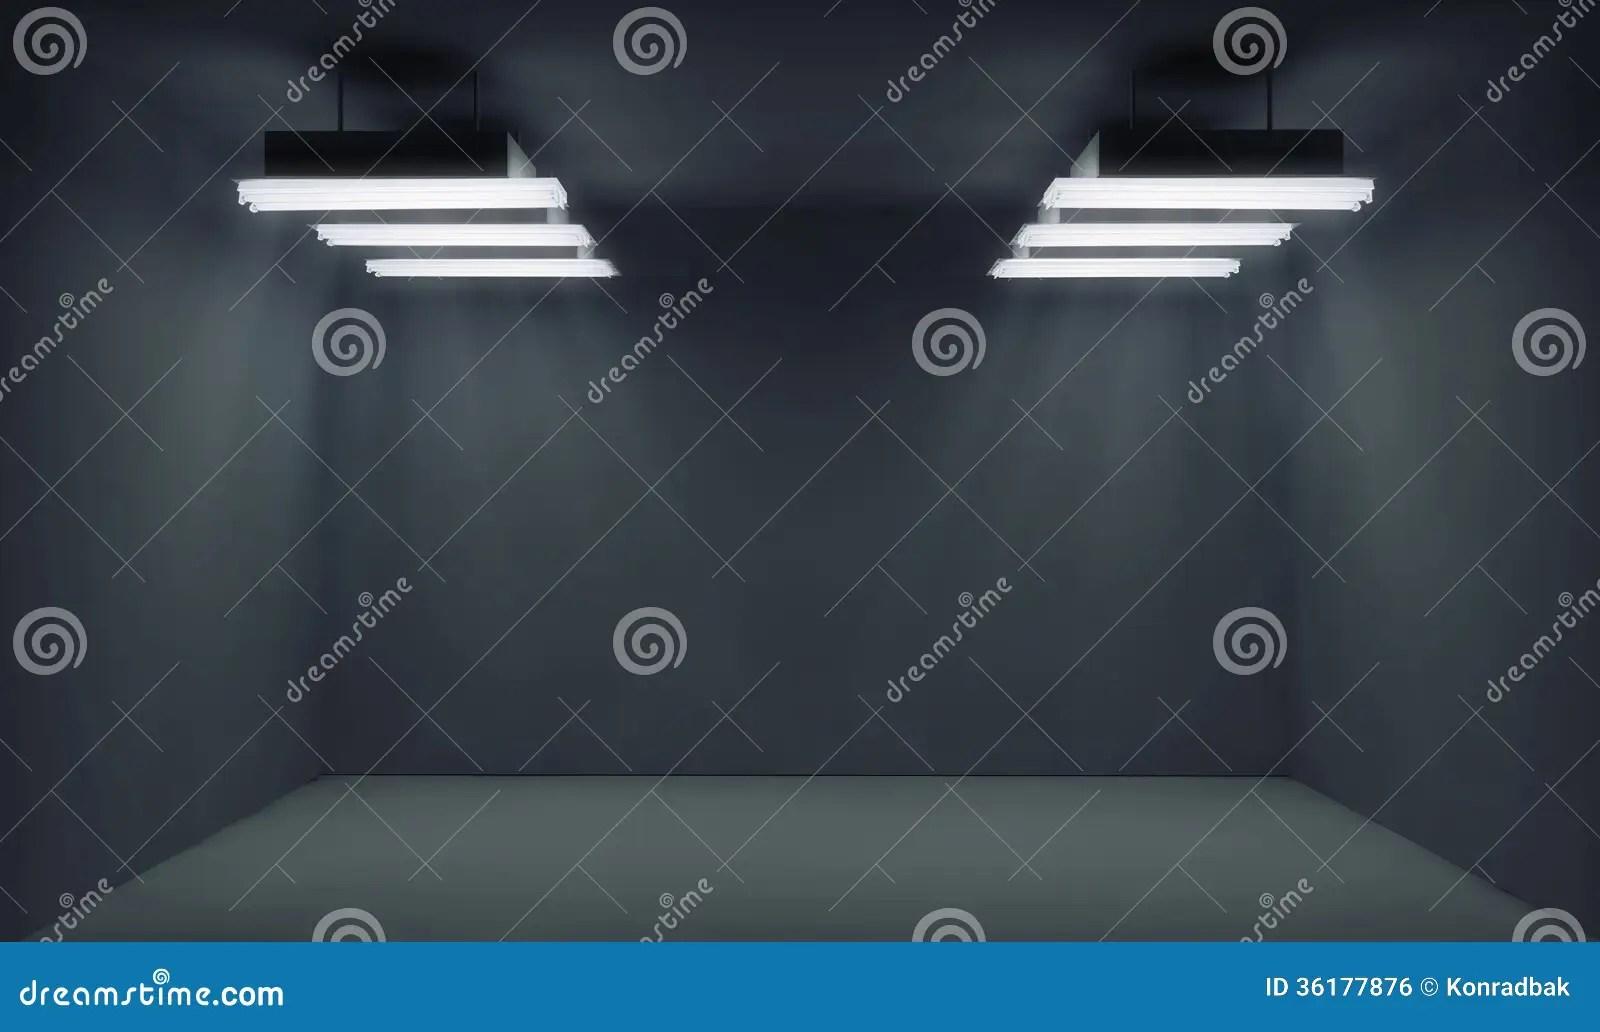 Empty Dark Room With Lightrays Royalty Free Stock Image